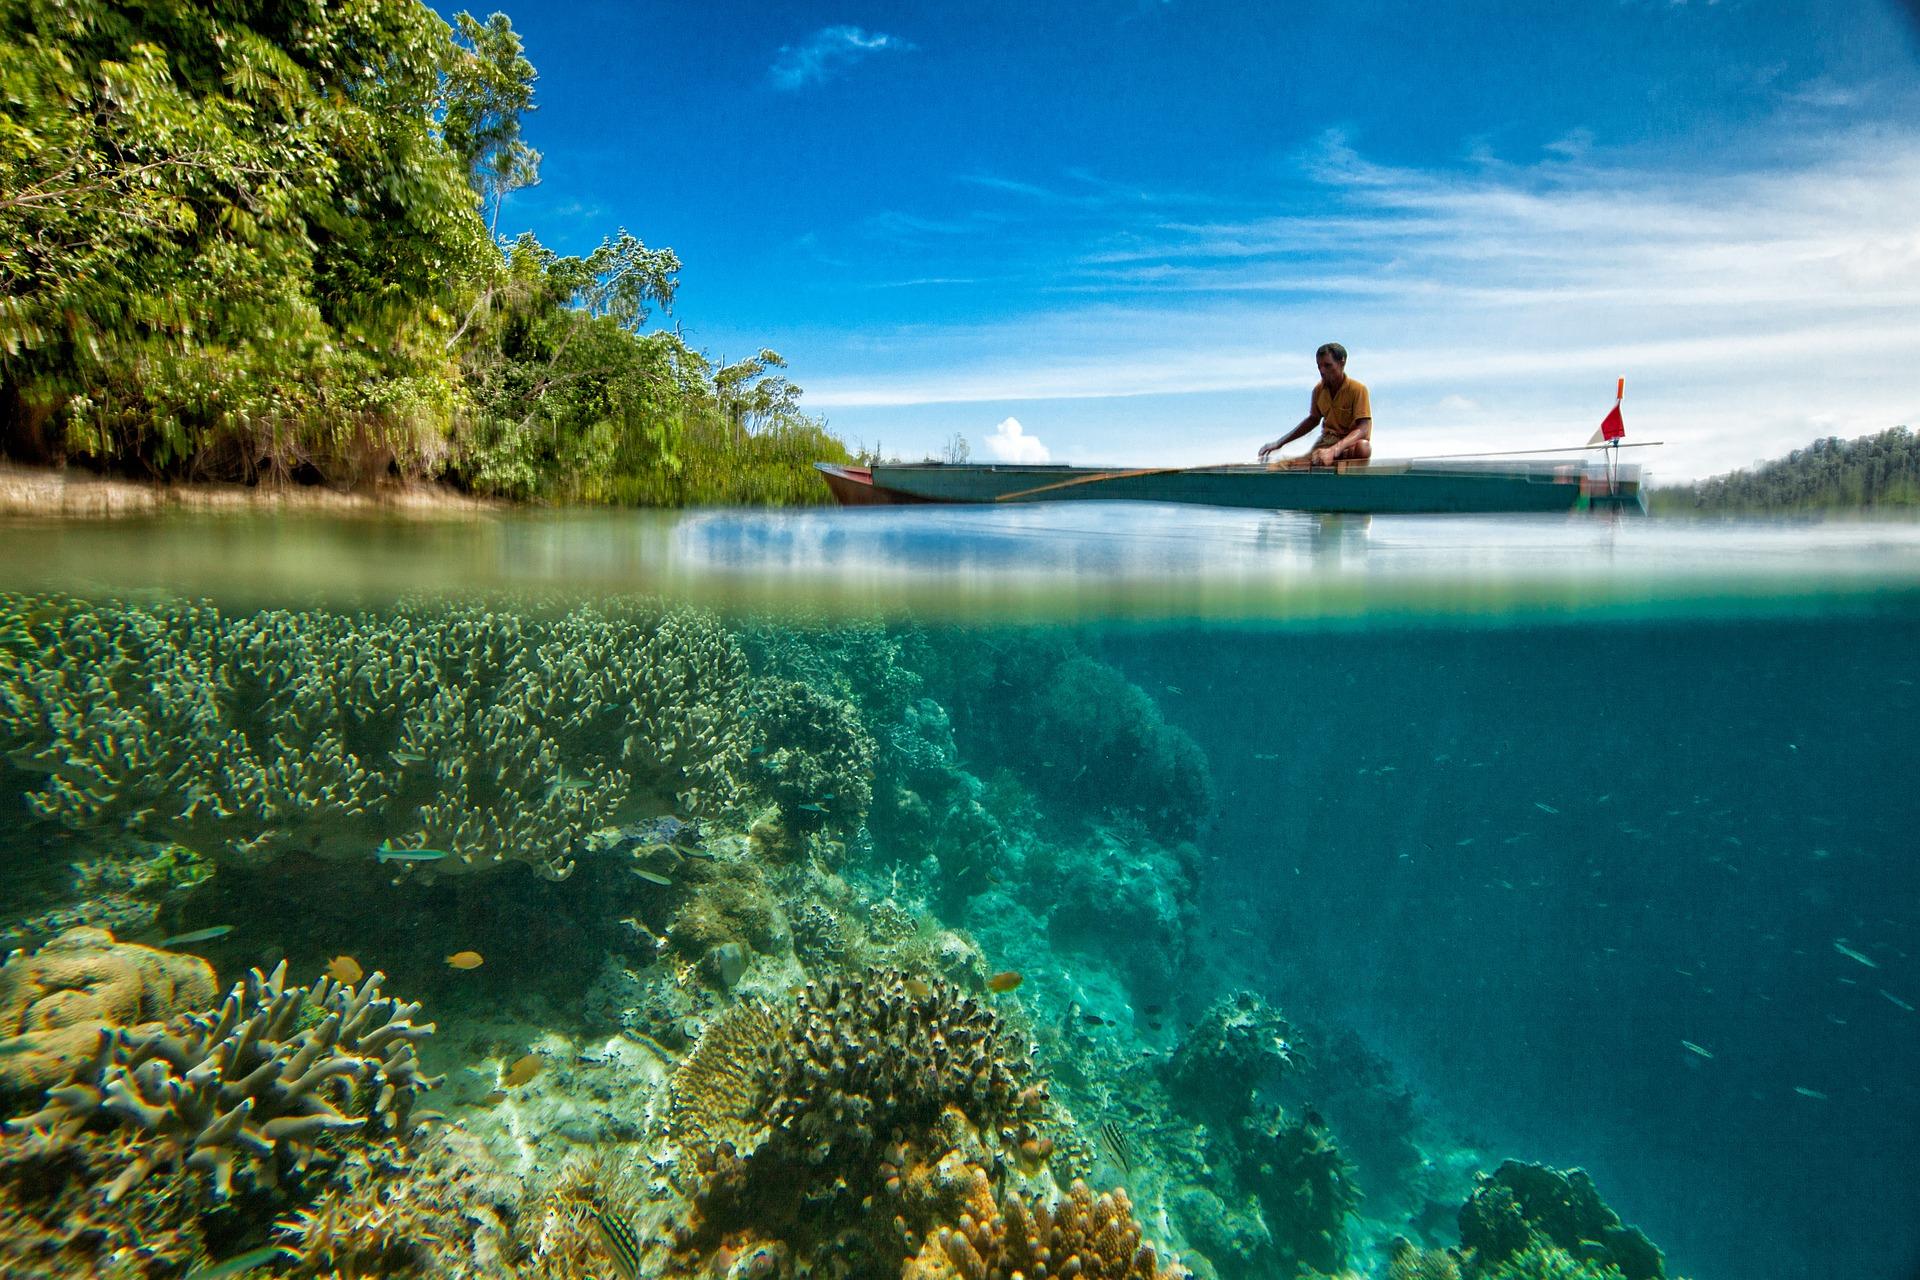 landscape-underwater-coral-reef-pixabay-kanenori.jpg